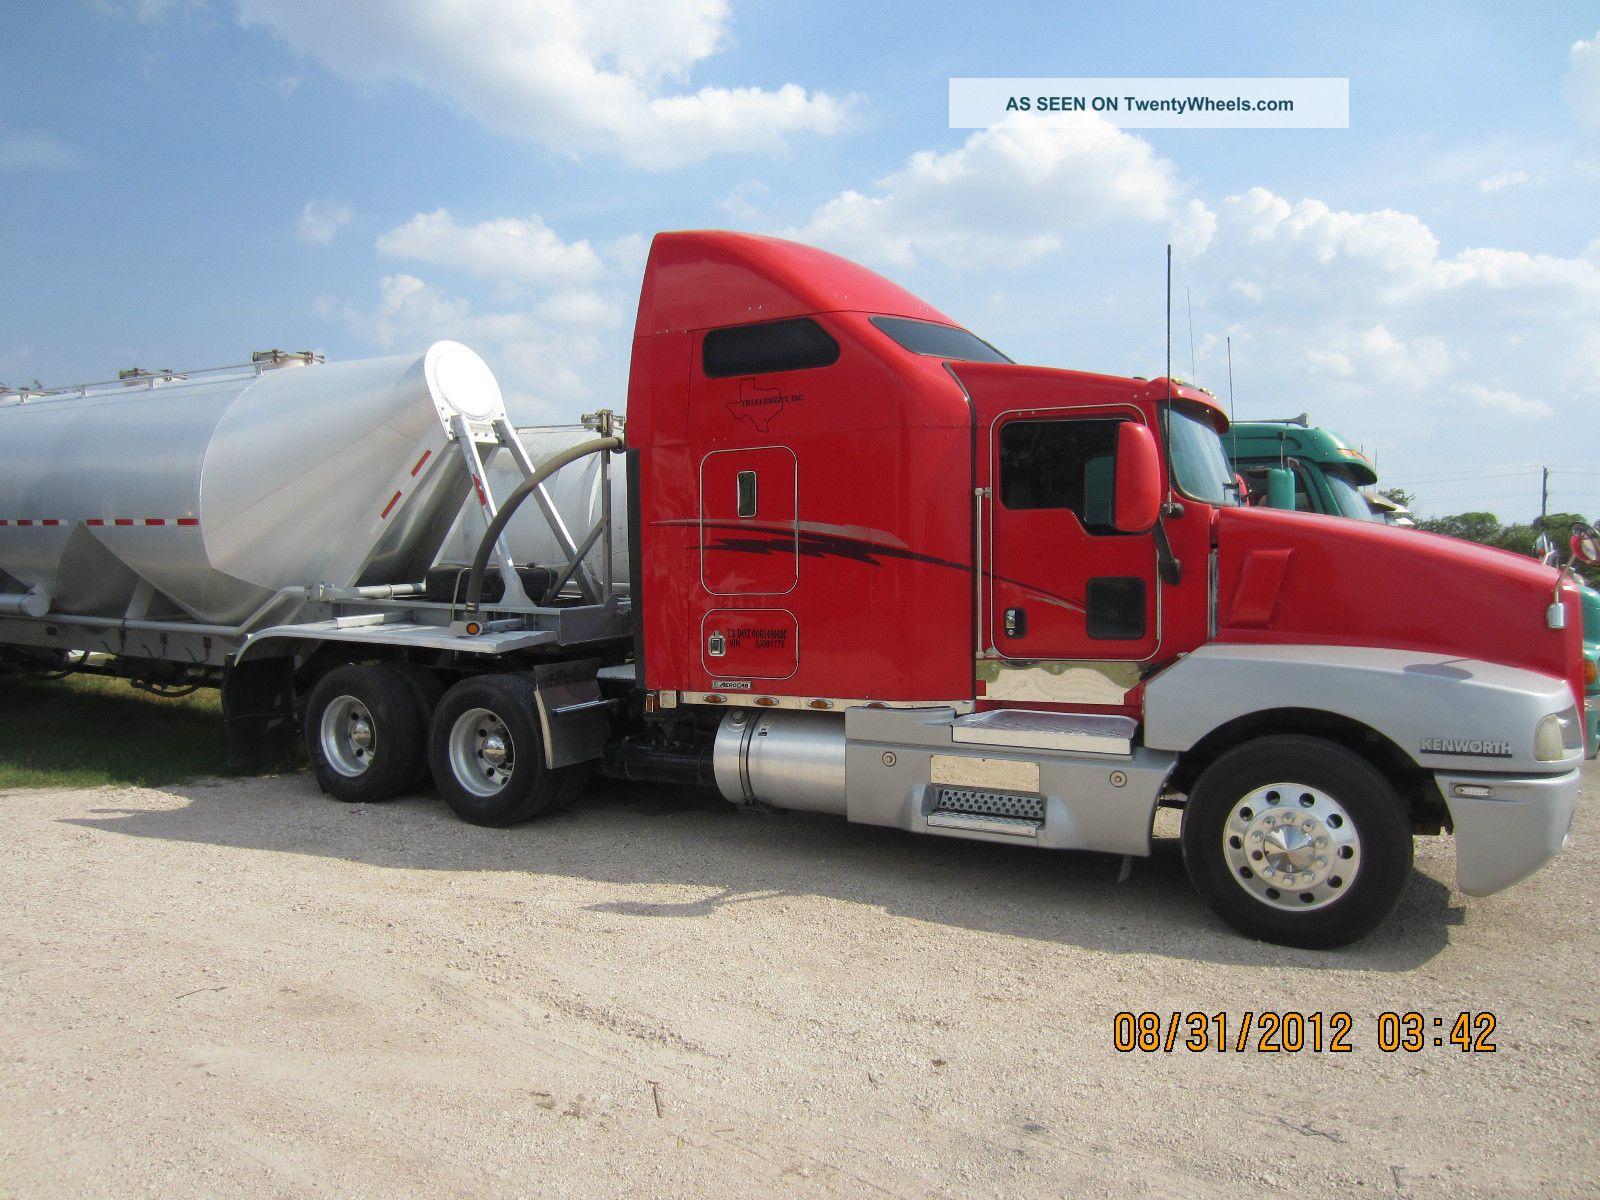 2005 Kenworth T600 Sleeper Semi Trucks photo